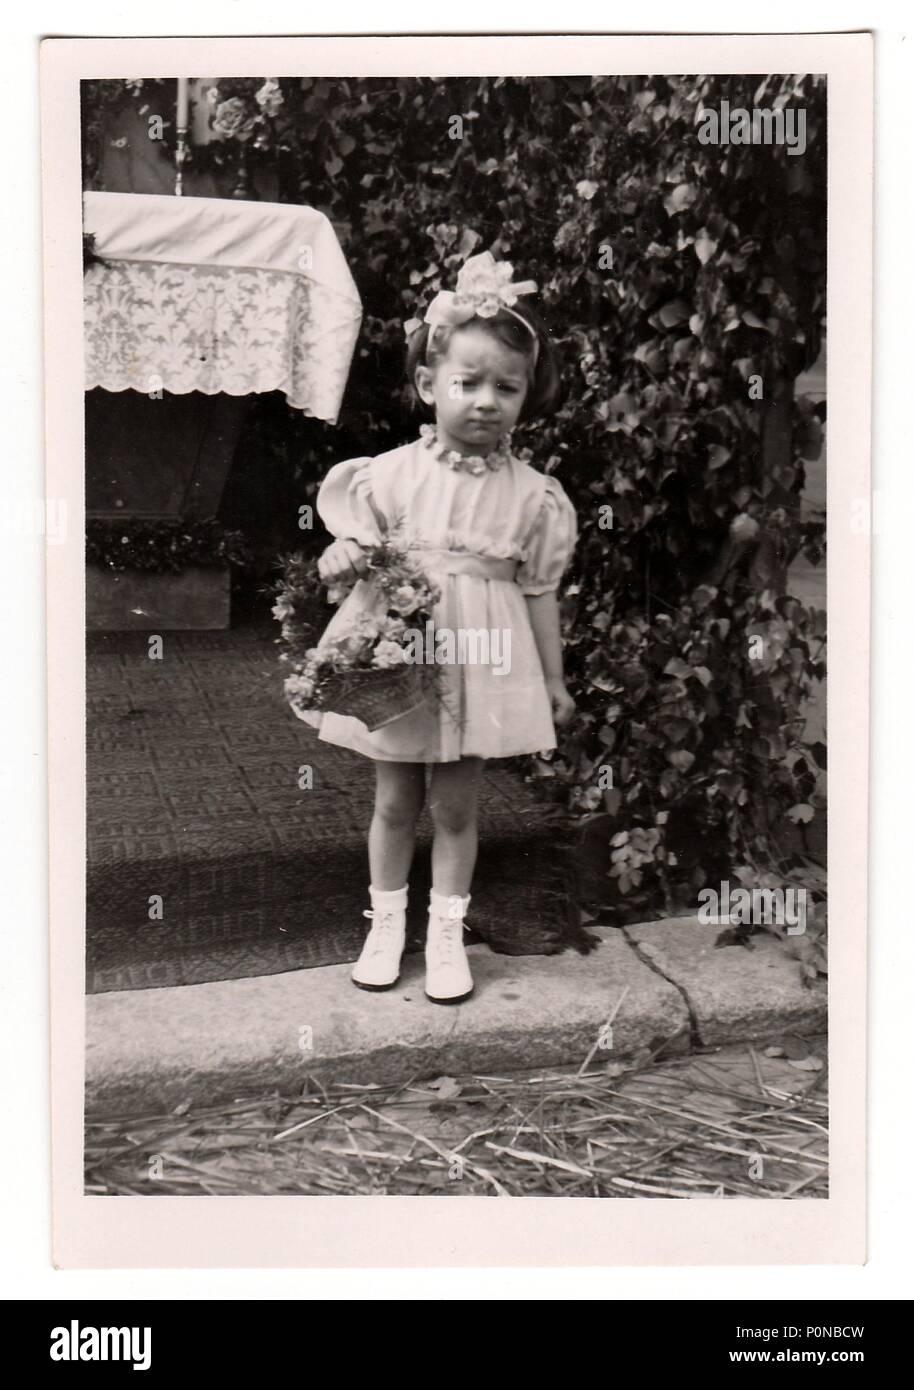 HODONIN, THE CZECHOSLOVAK REPUBLIC, CIRCA 1943:  Vintage photo shows a small girl during religious (catholic) celebration, circa 1943. - Stock Image